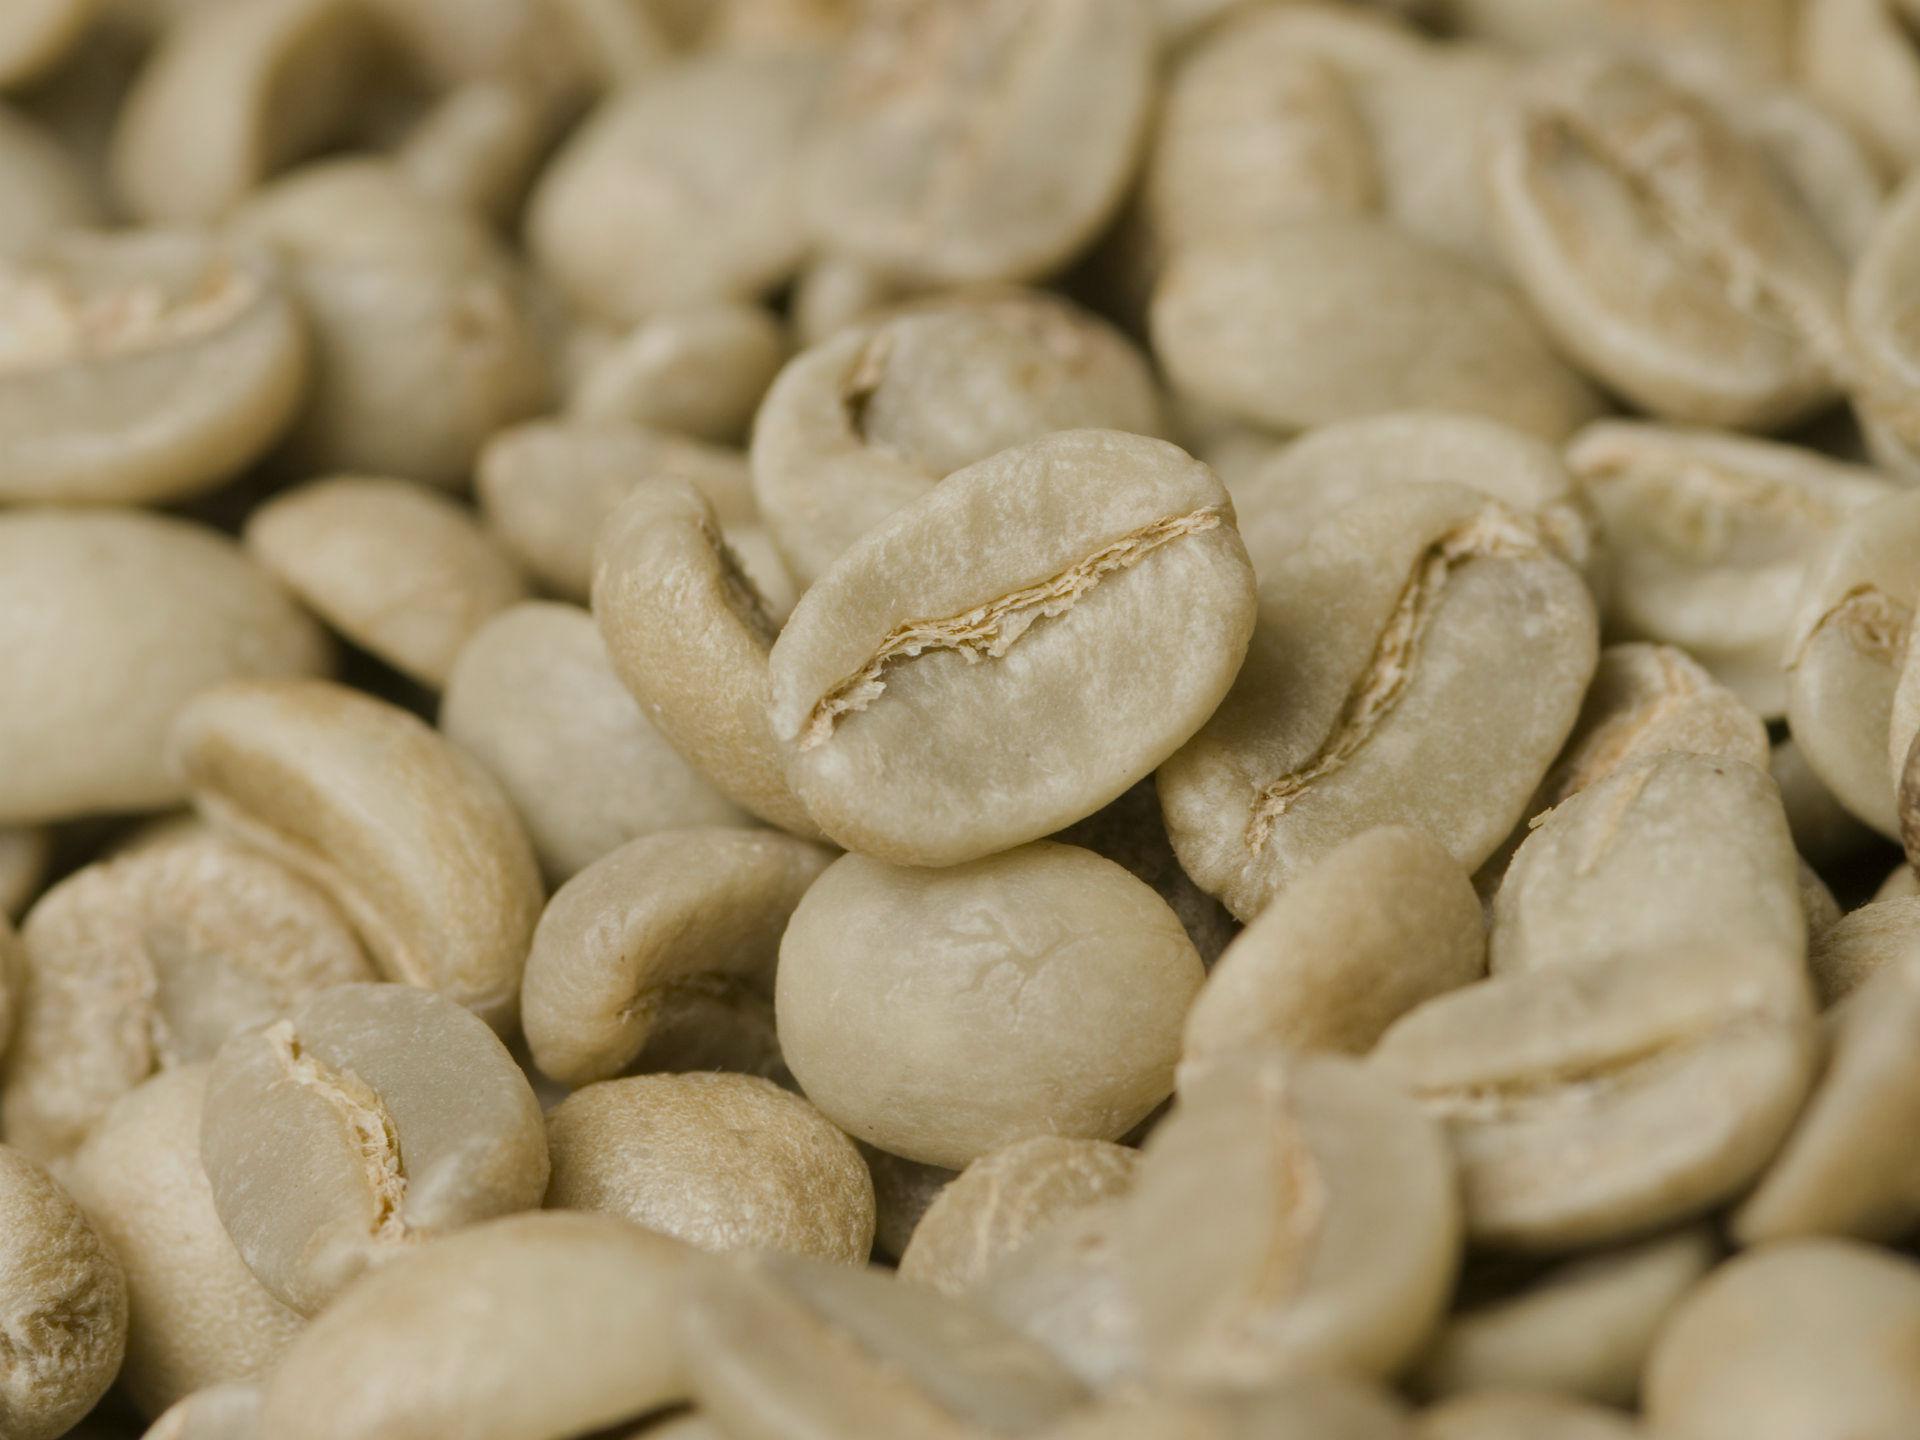 THE COFFEE ALCHEMIST